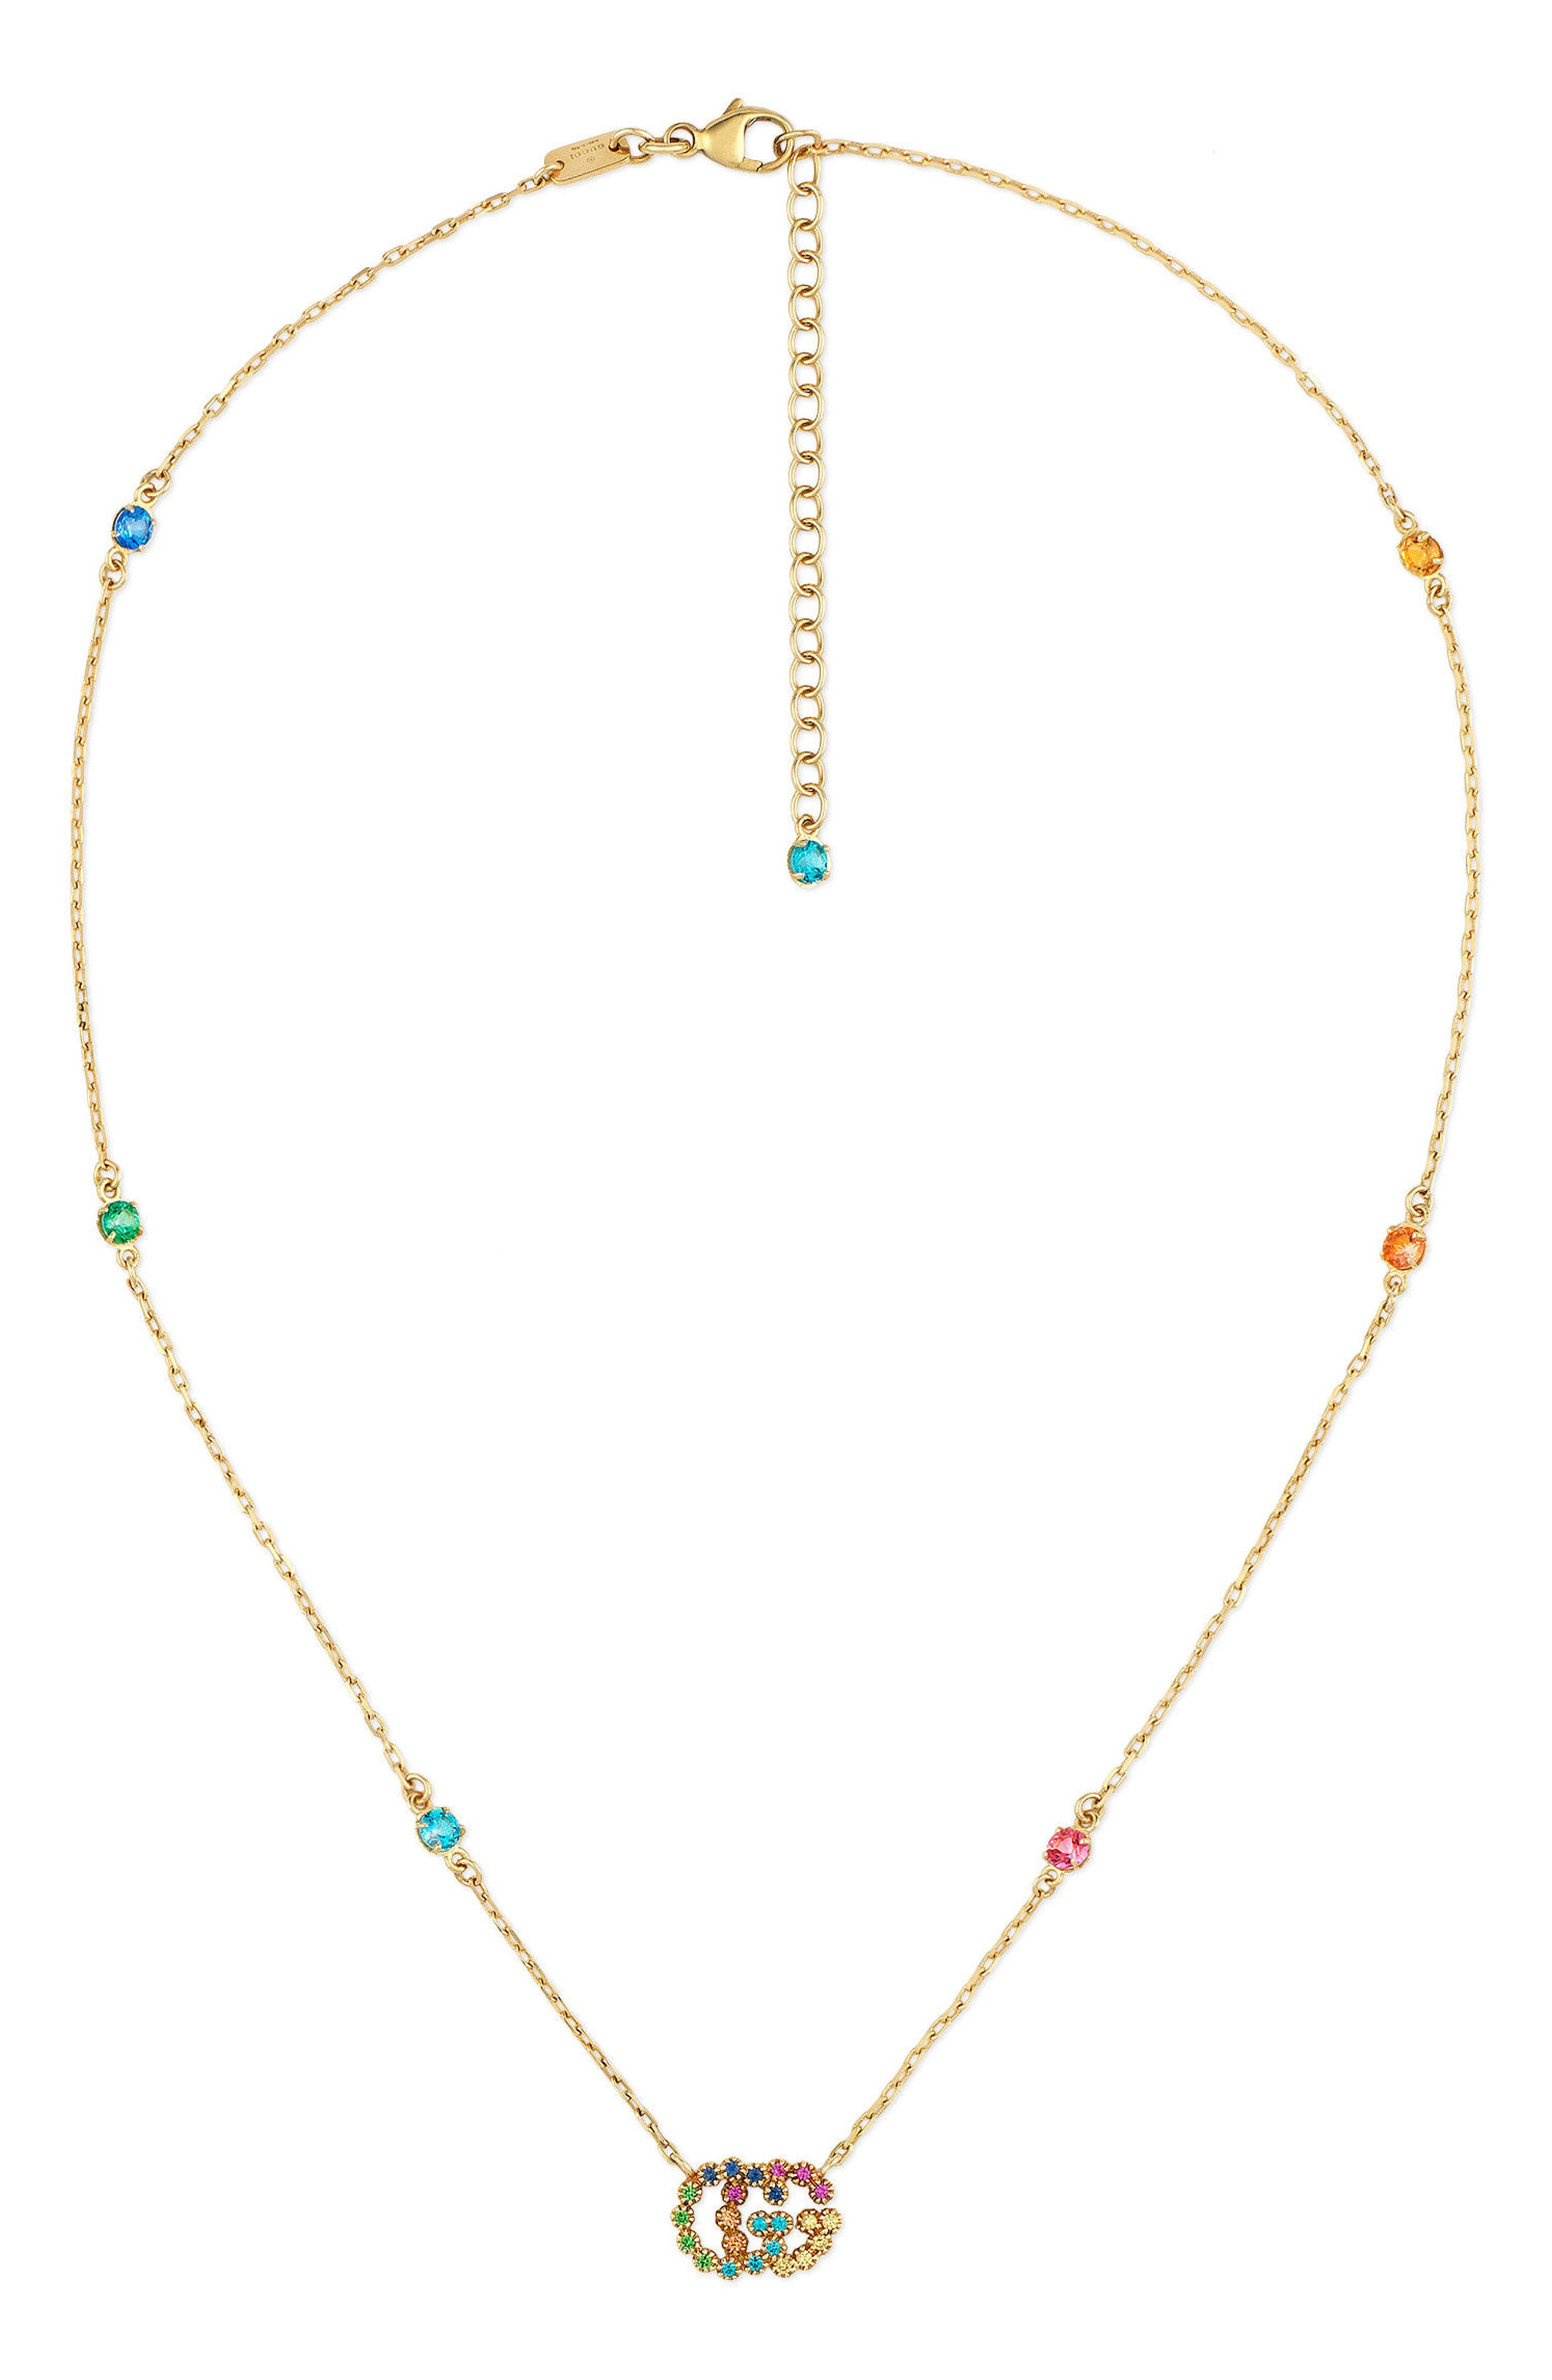 Running G Semiprecius Stone Pendant Necklace,                         Main,                         color, YELLOW GOLD